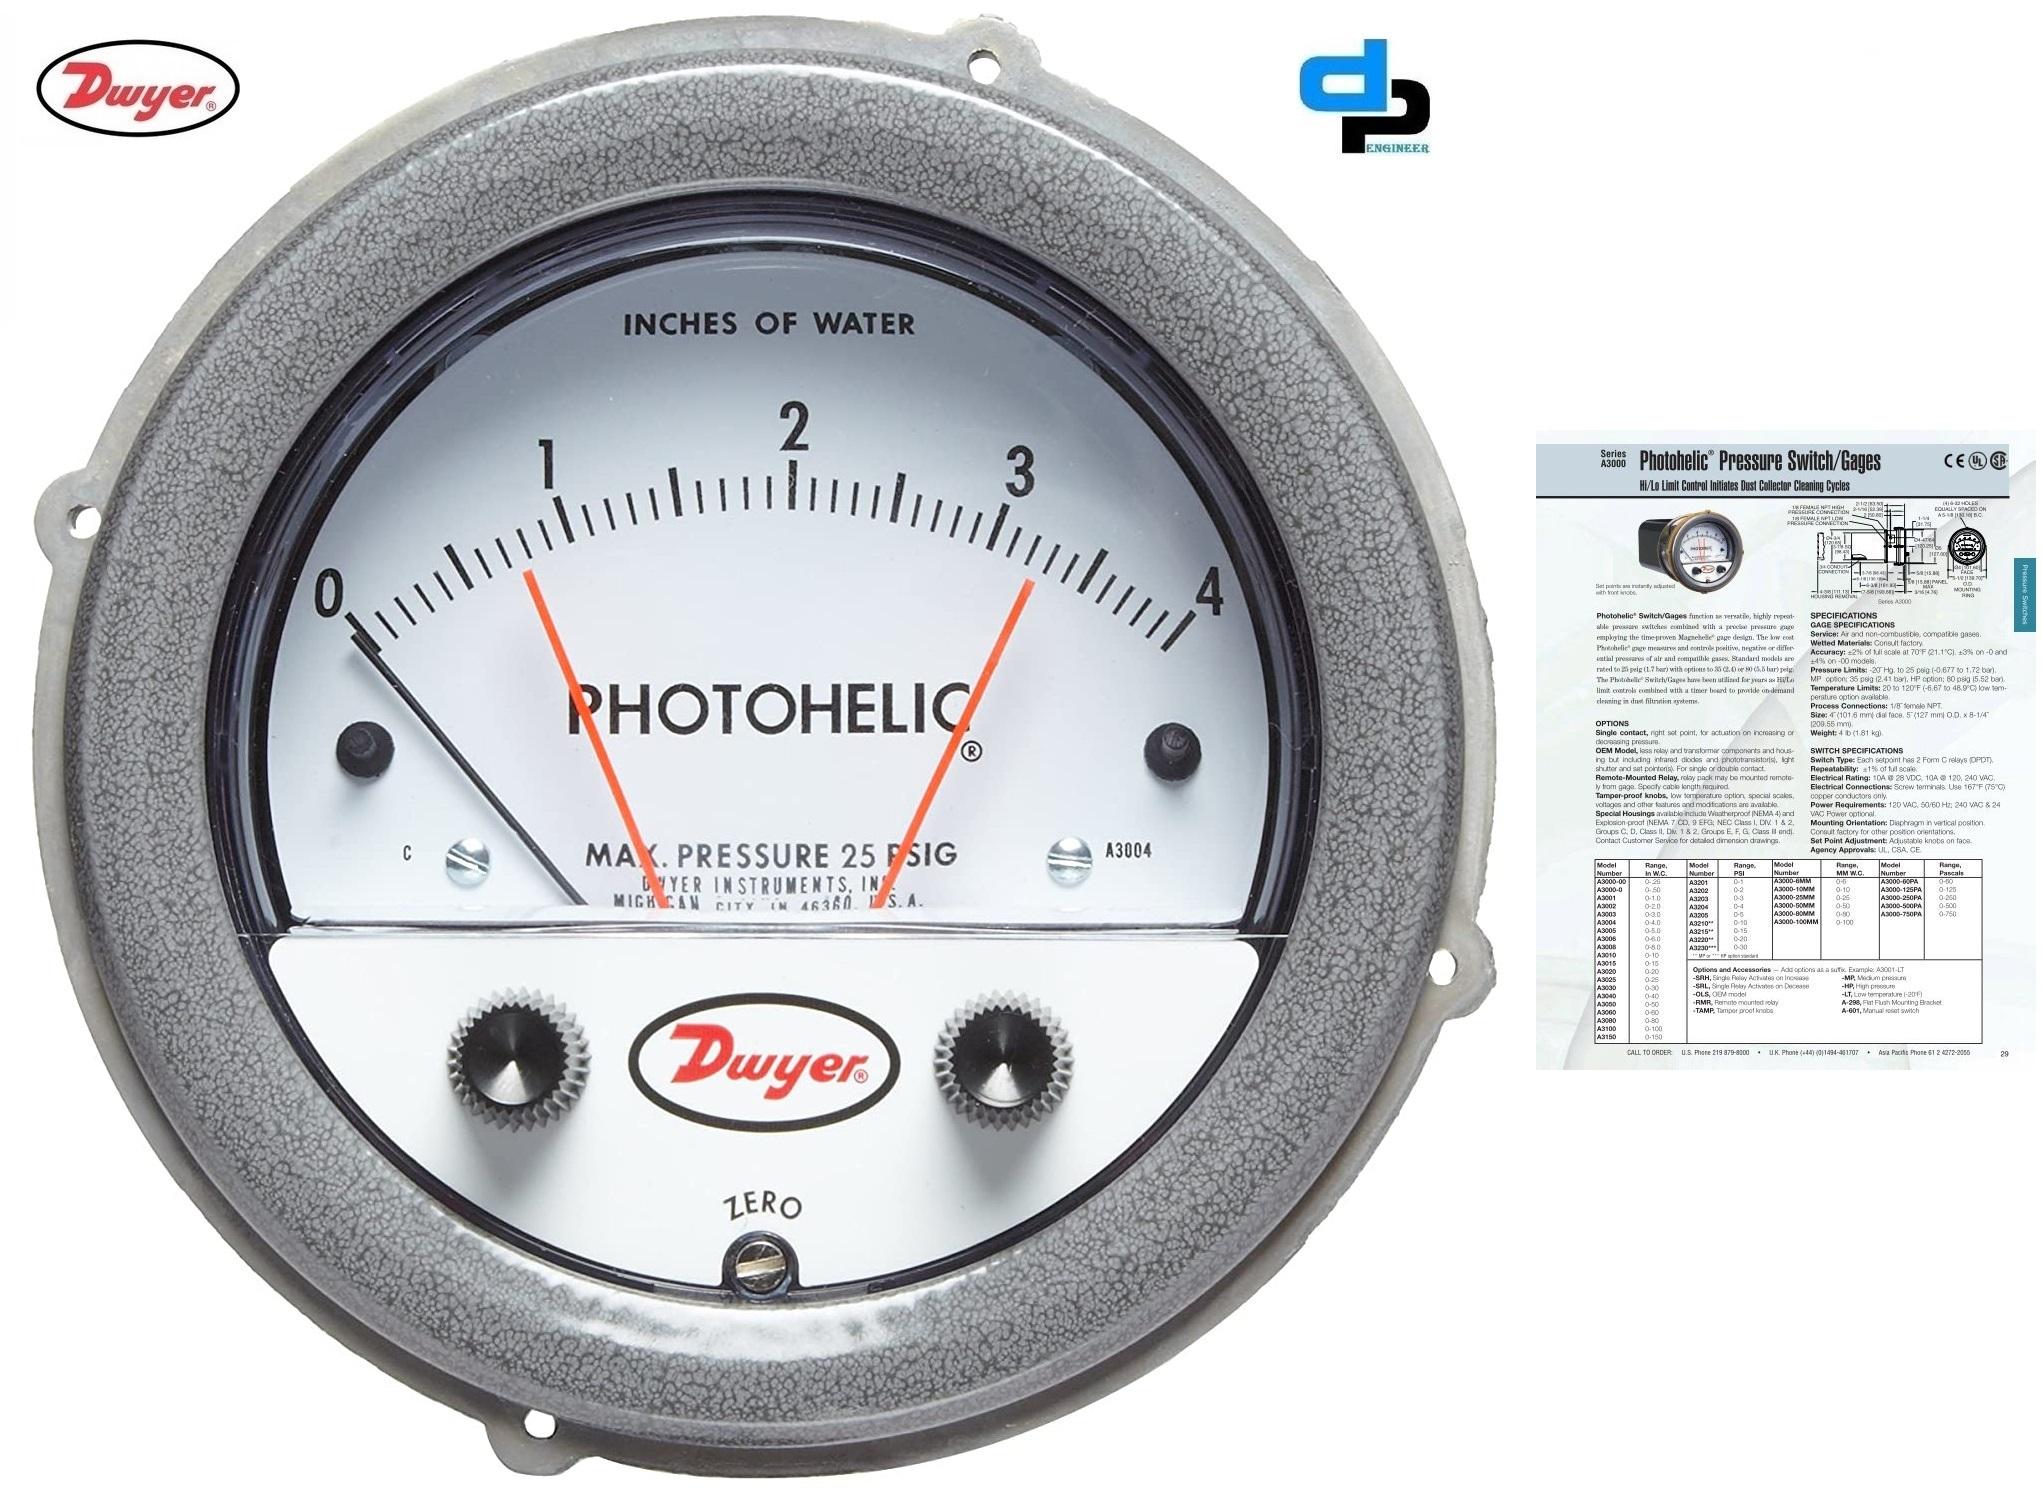 Dwyer A3000-1.5KPA Photohelic Pressure Switch